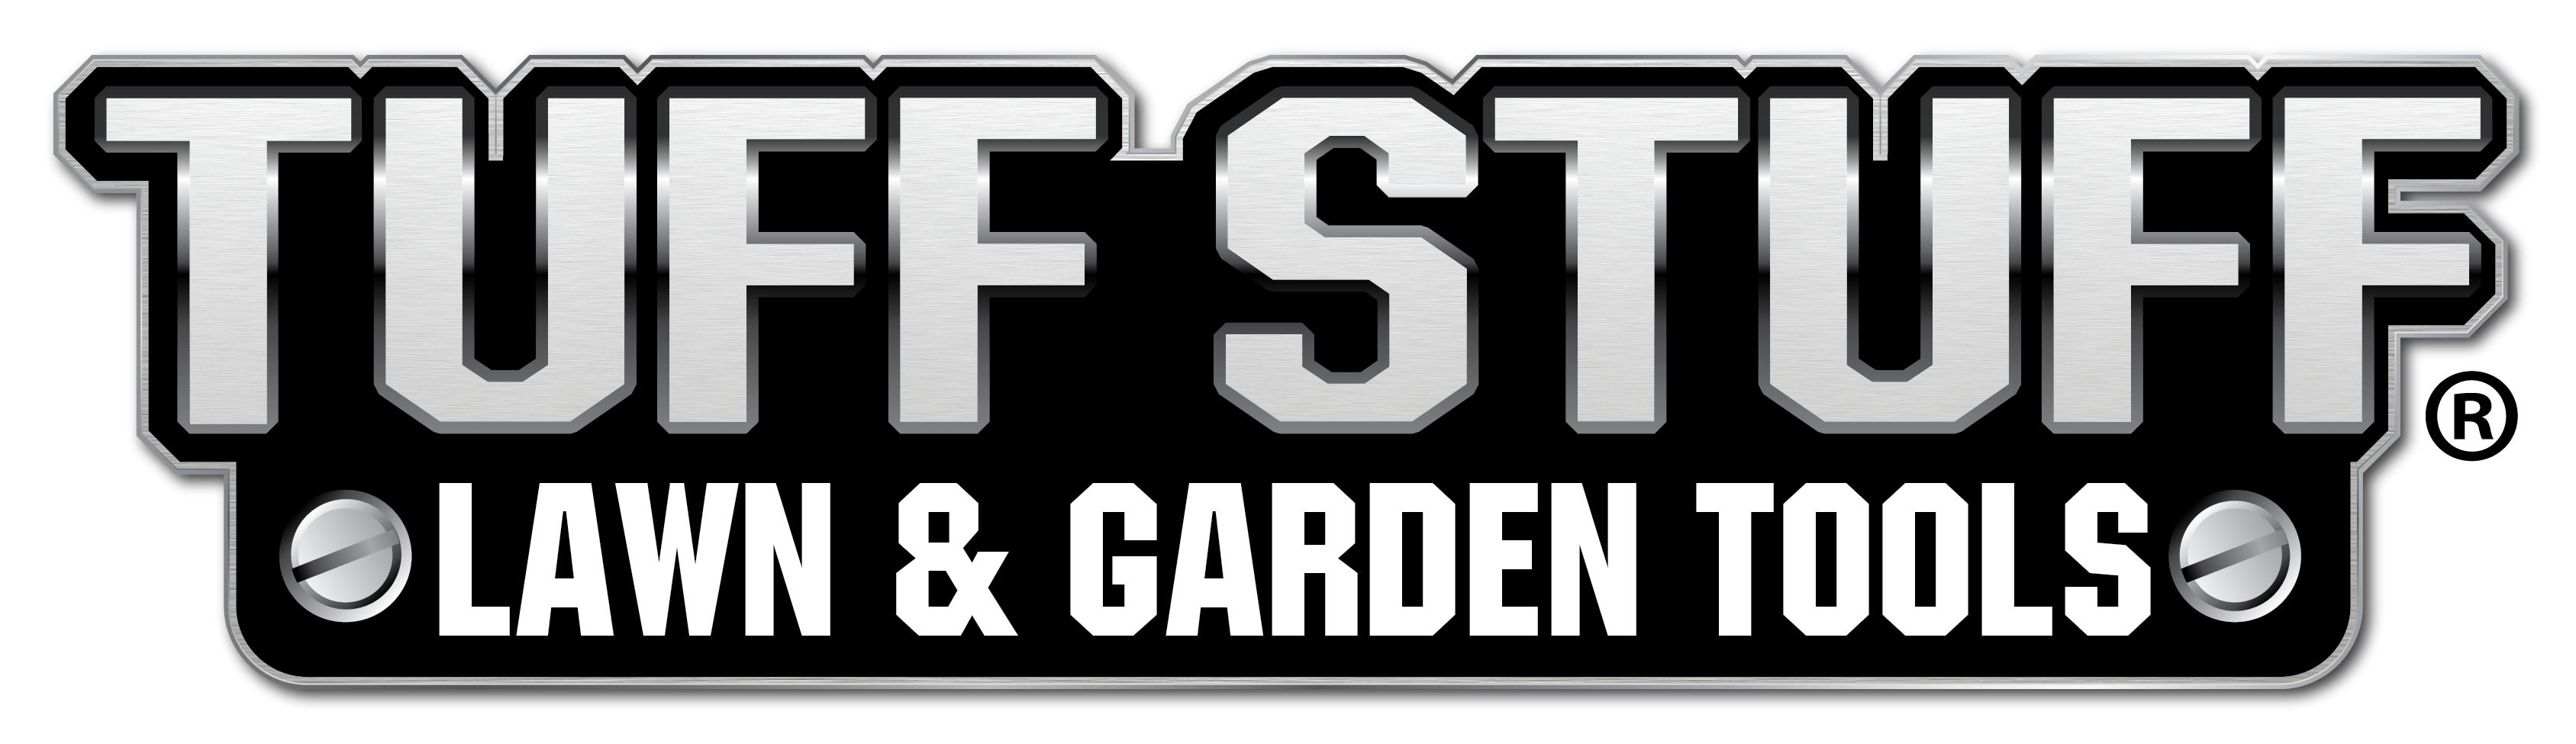 Lawn / Garden & Seasonal Tools